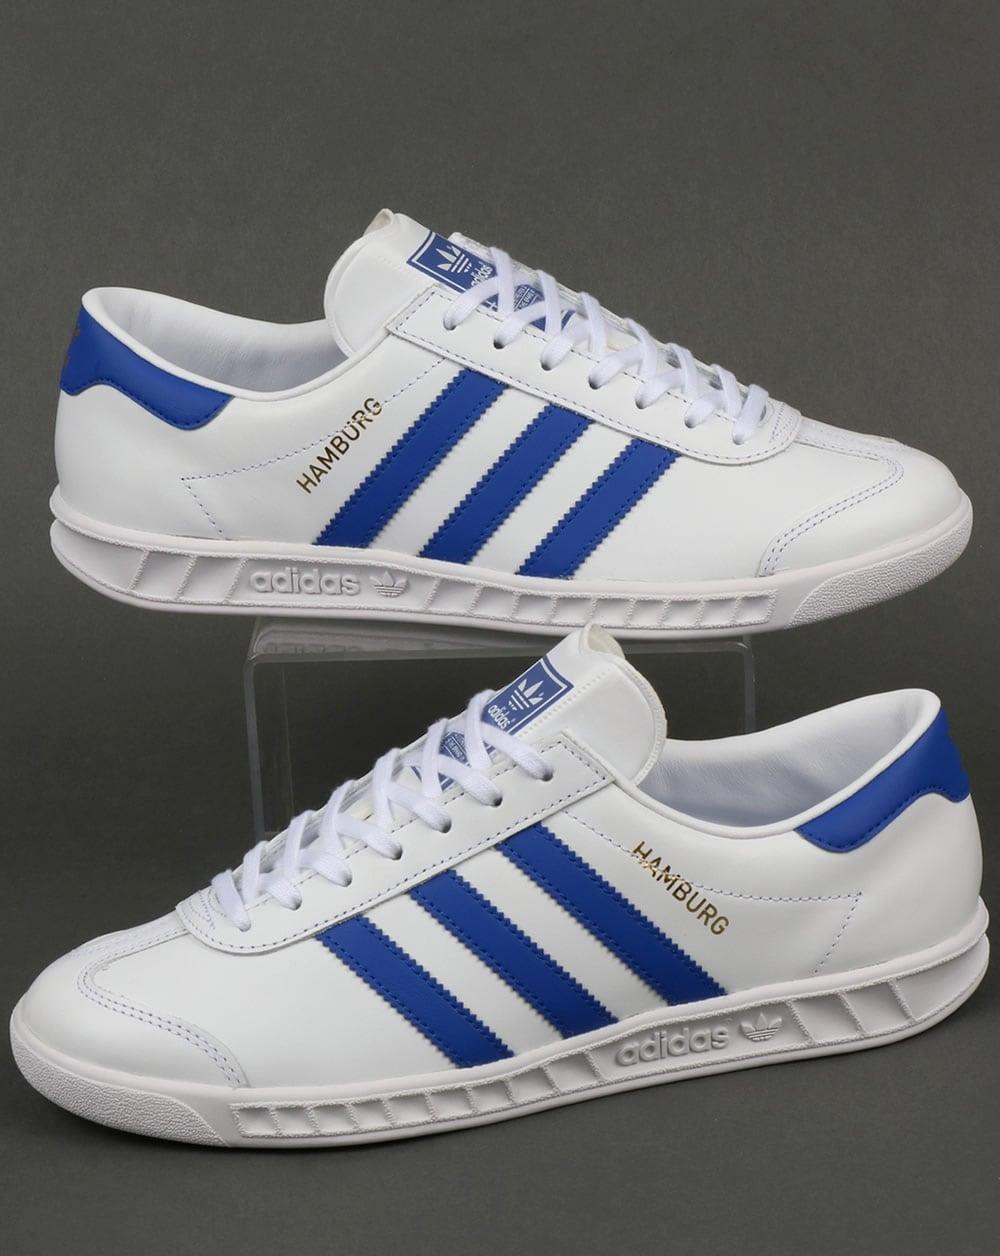 Adidas Hamburg Trainers White/Bold Blue,originals,mens ...